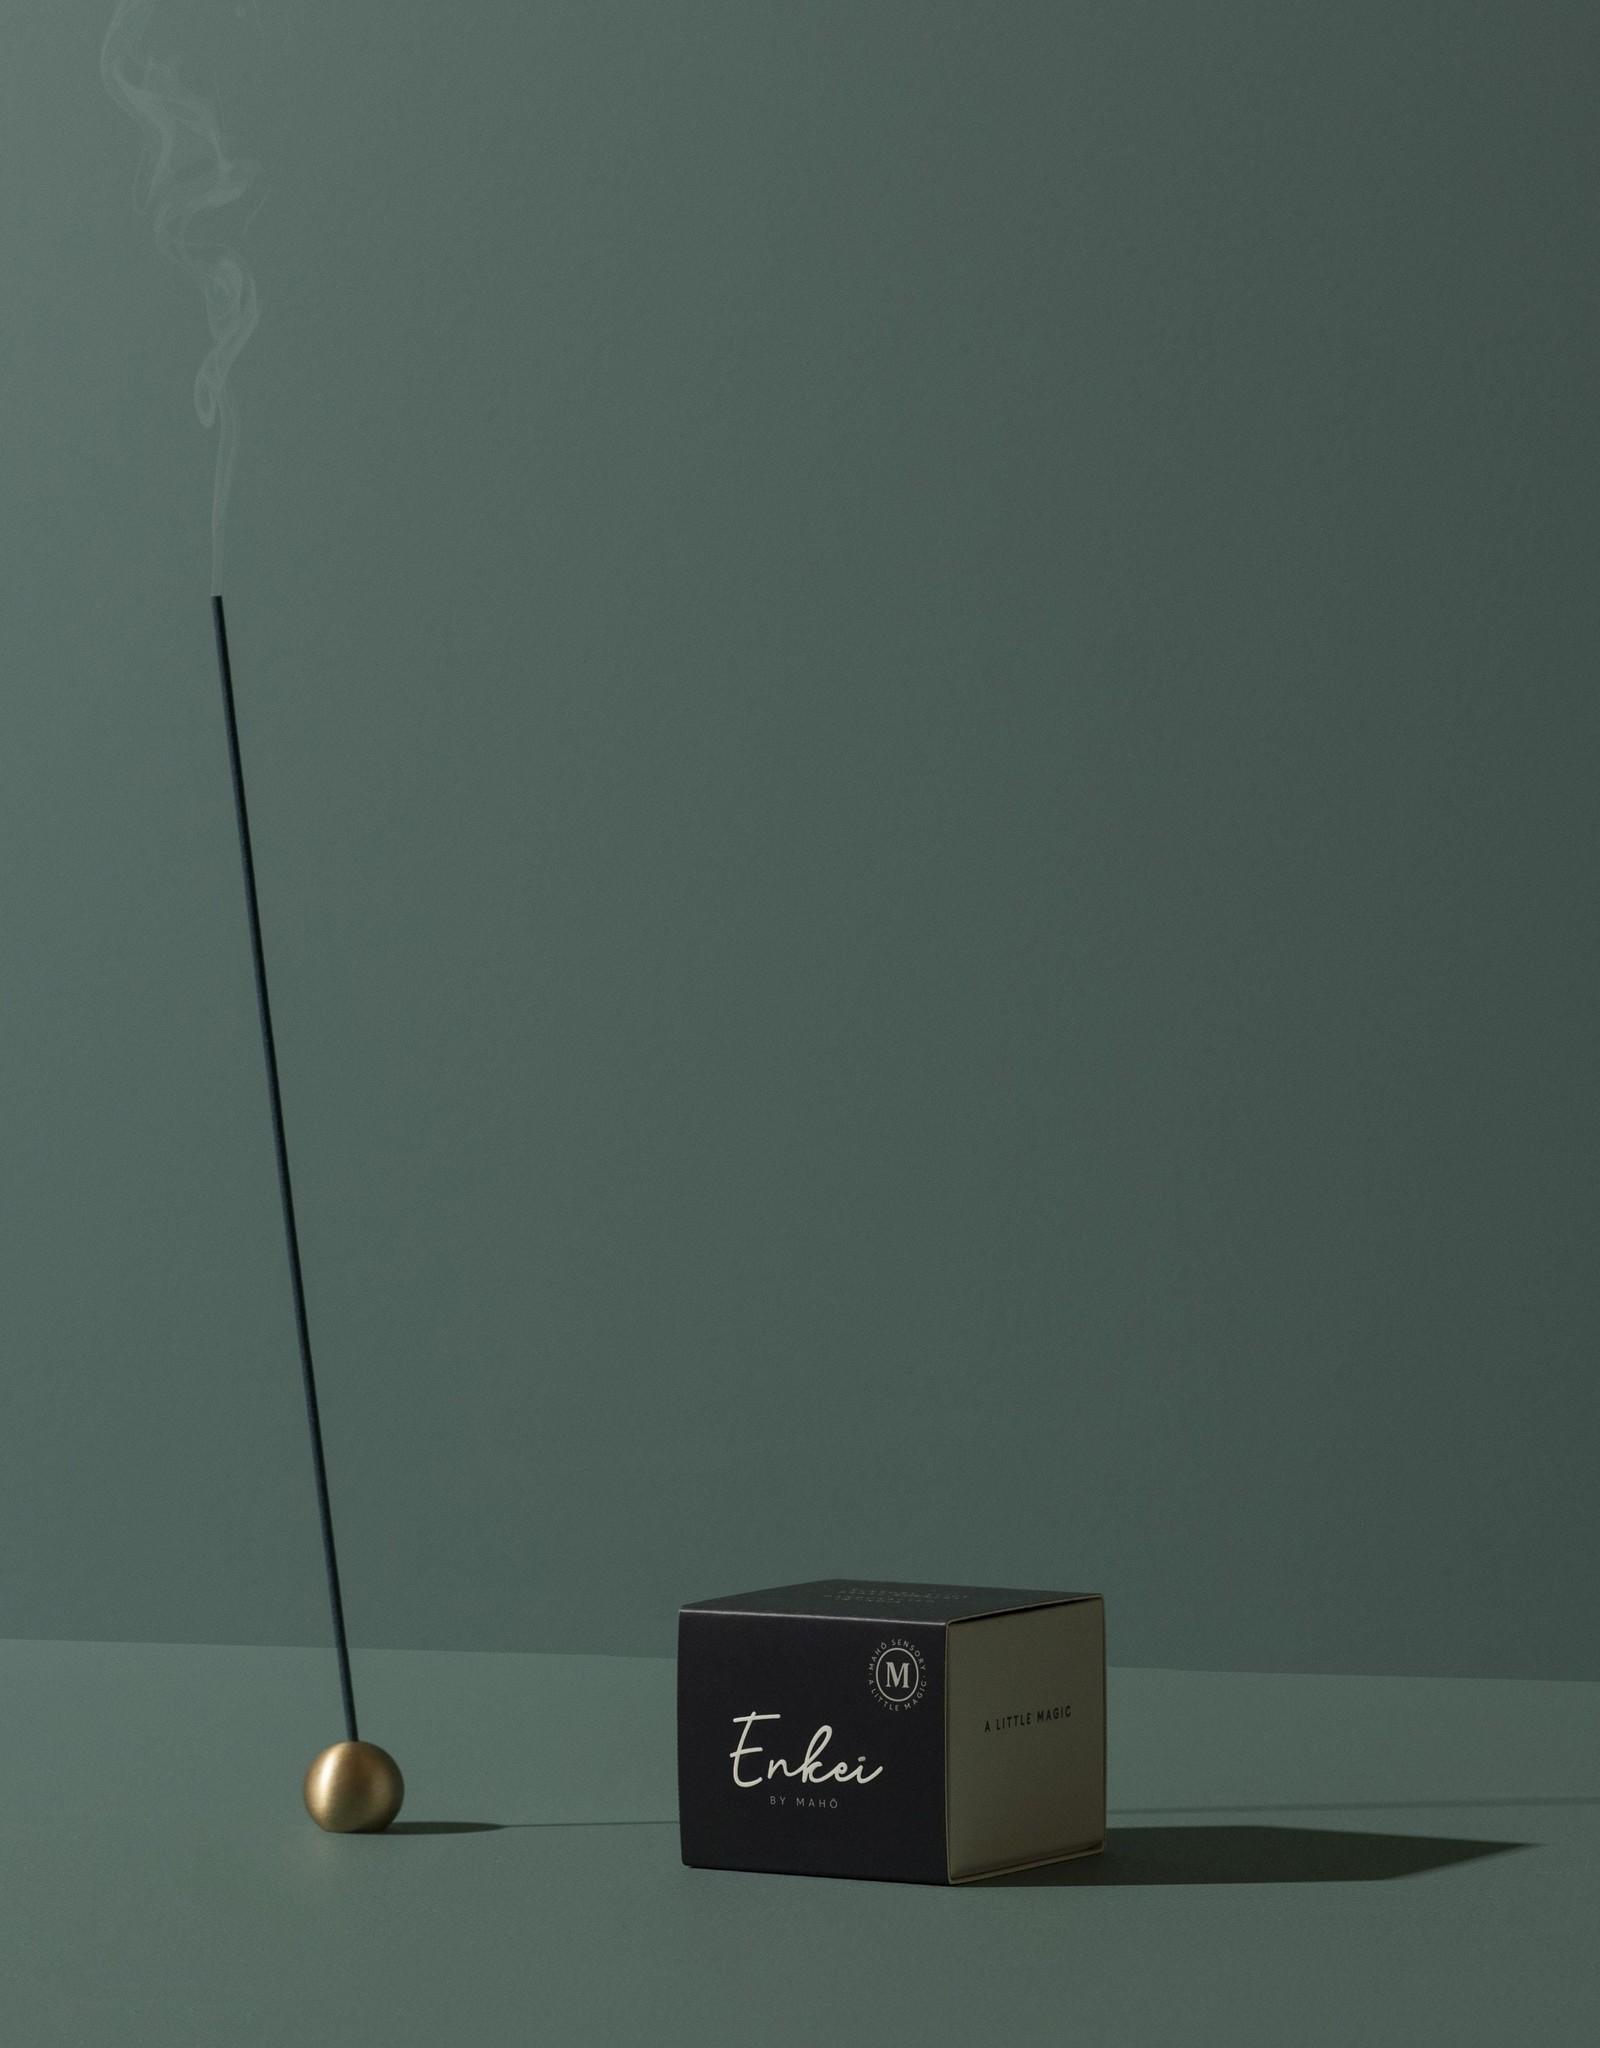 Maho ENKEI Burners and Hardware